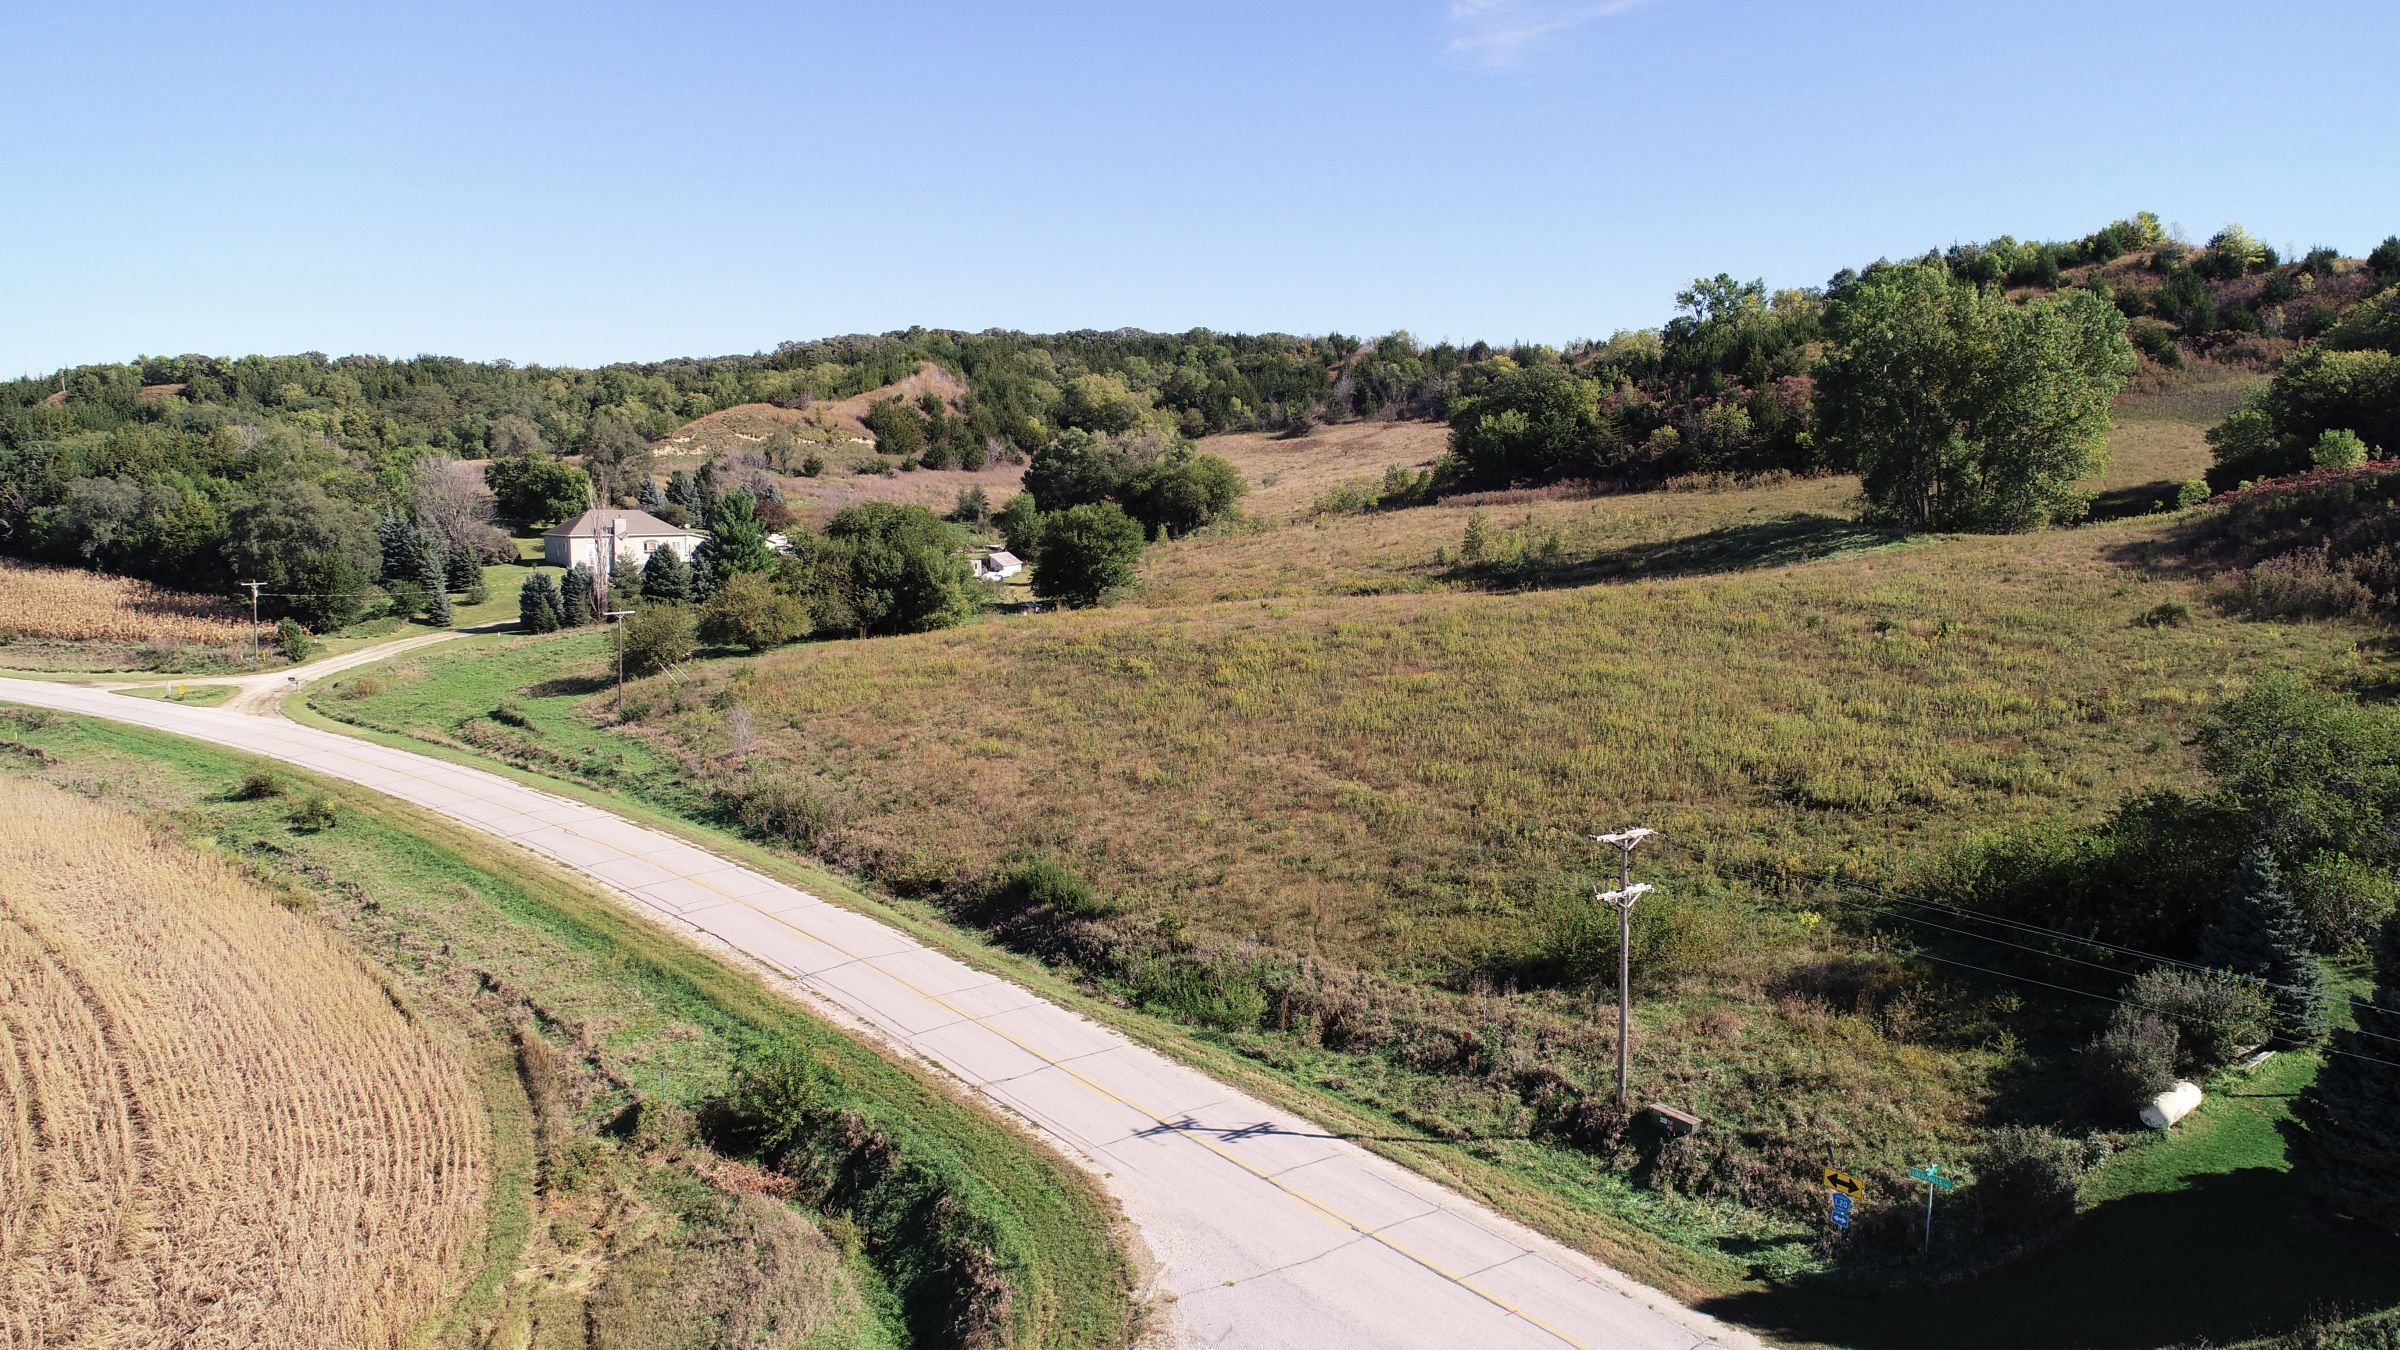 land-harrison-county-iowa-59-acres-listing-number-15527-2-2021-05-21-212627.JPG